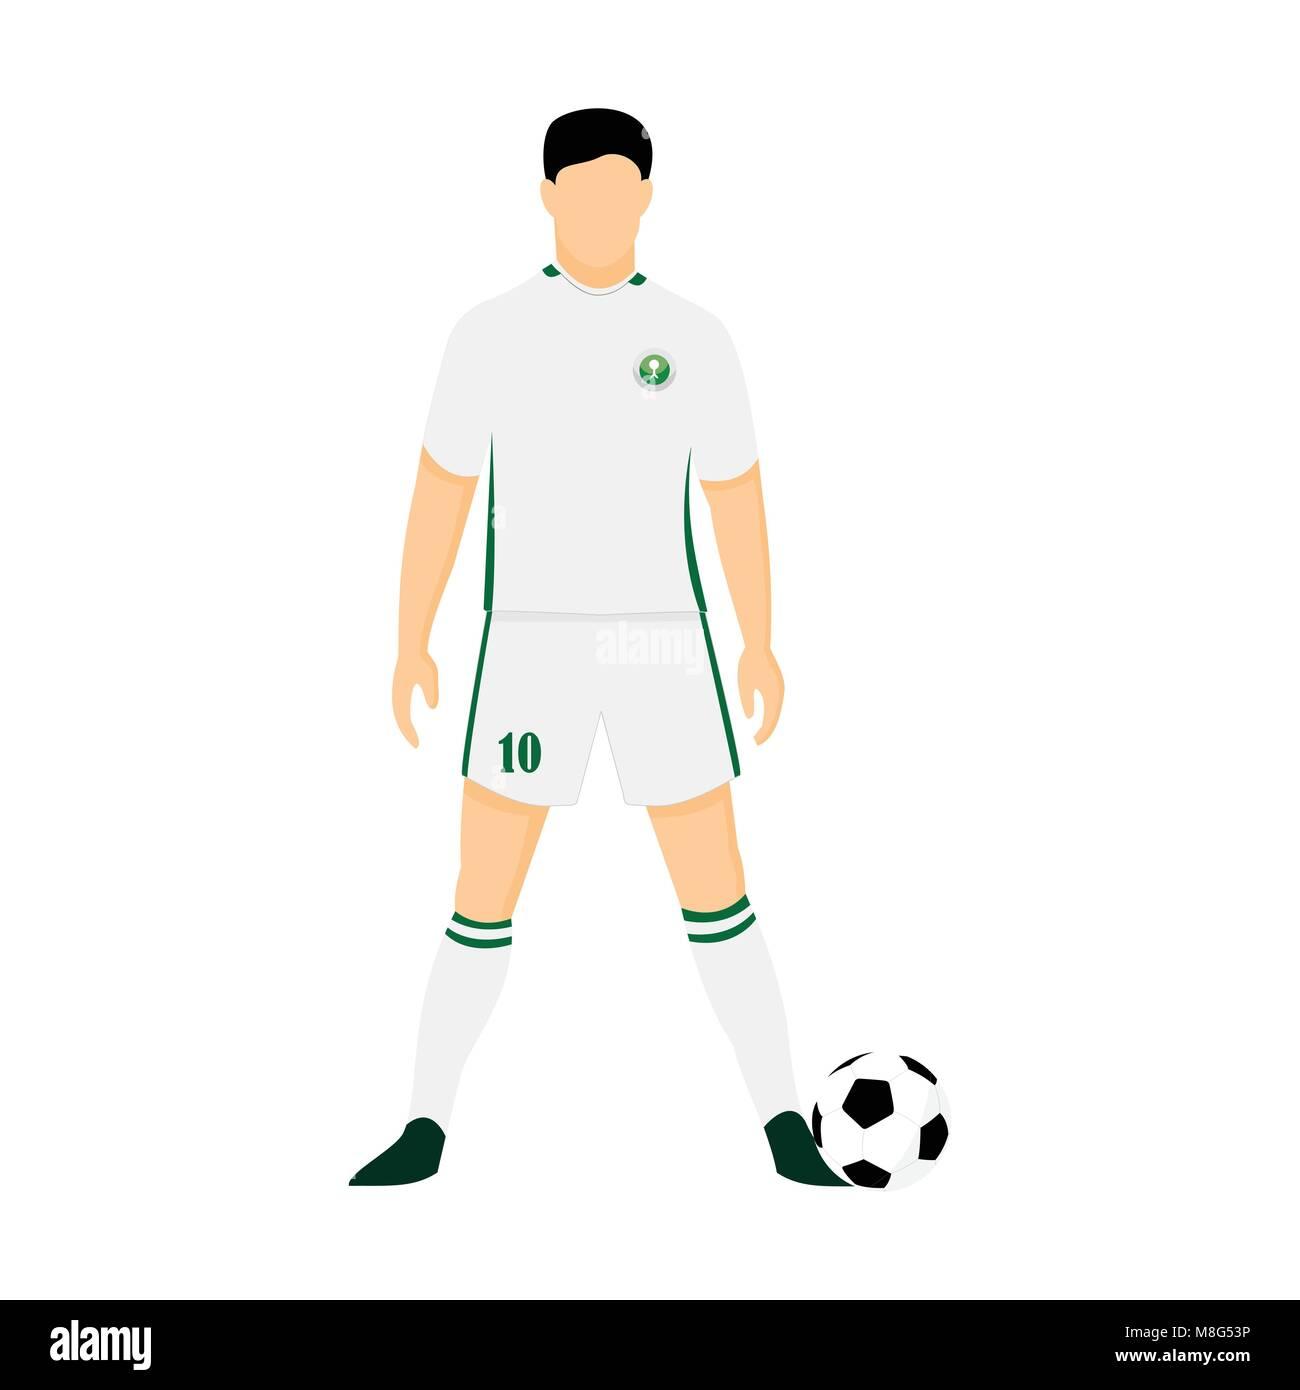 8a7ba5cffc8 Saudi Arabia Football Jersey National Team World Cup Vector Illustration  Graphic Design